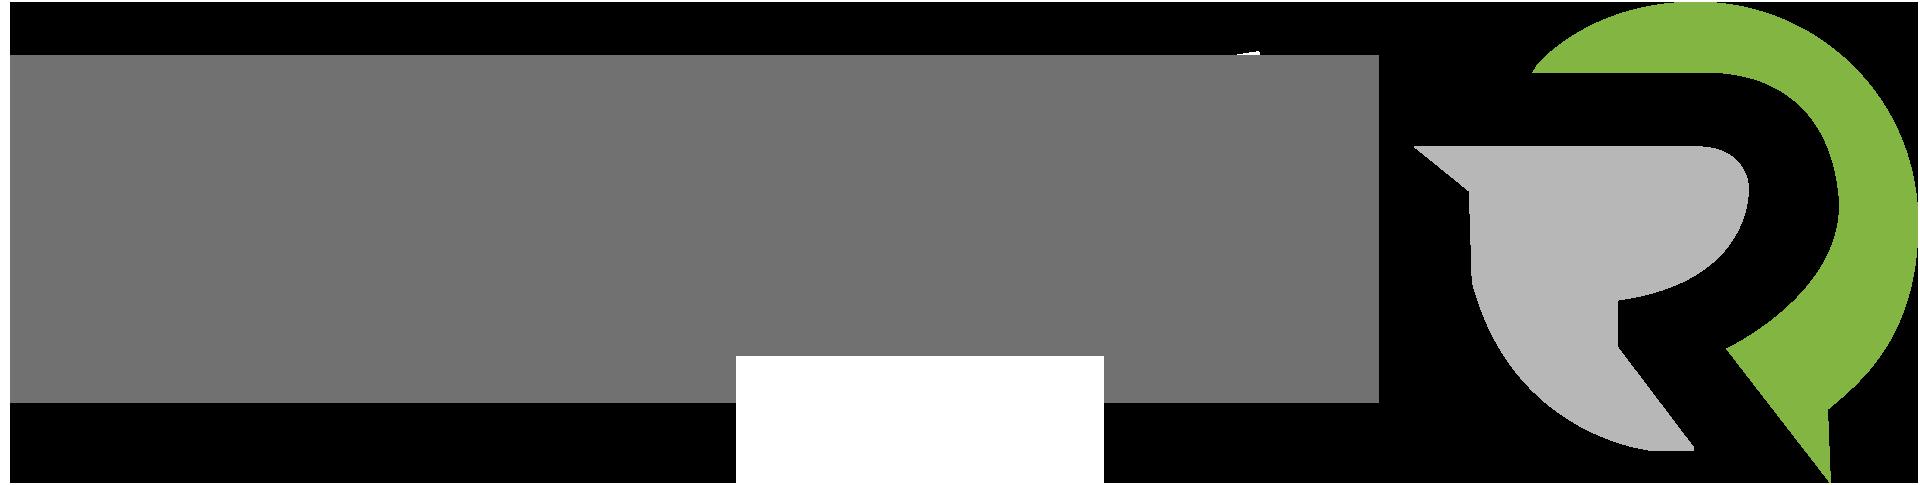 RtlTheme Logo Top